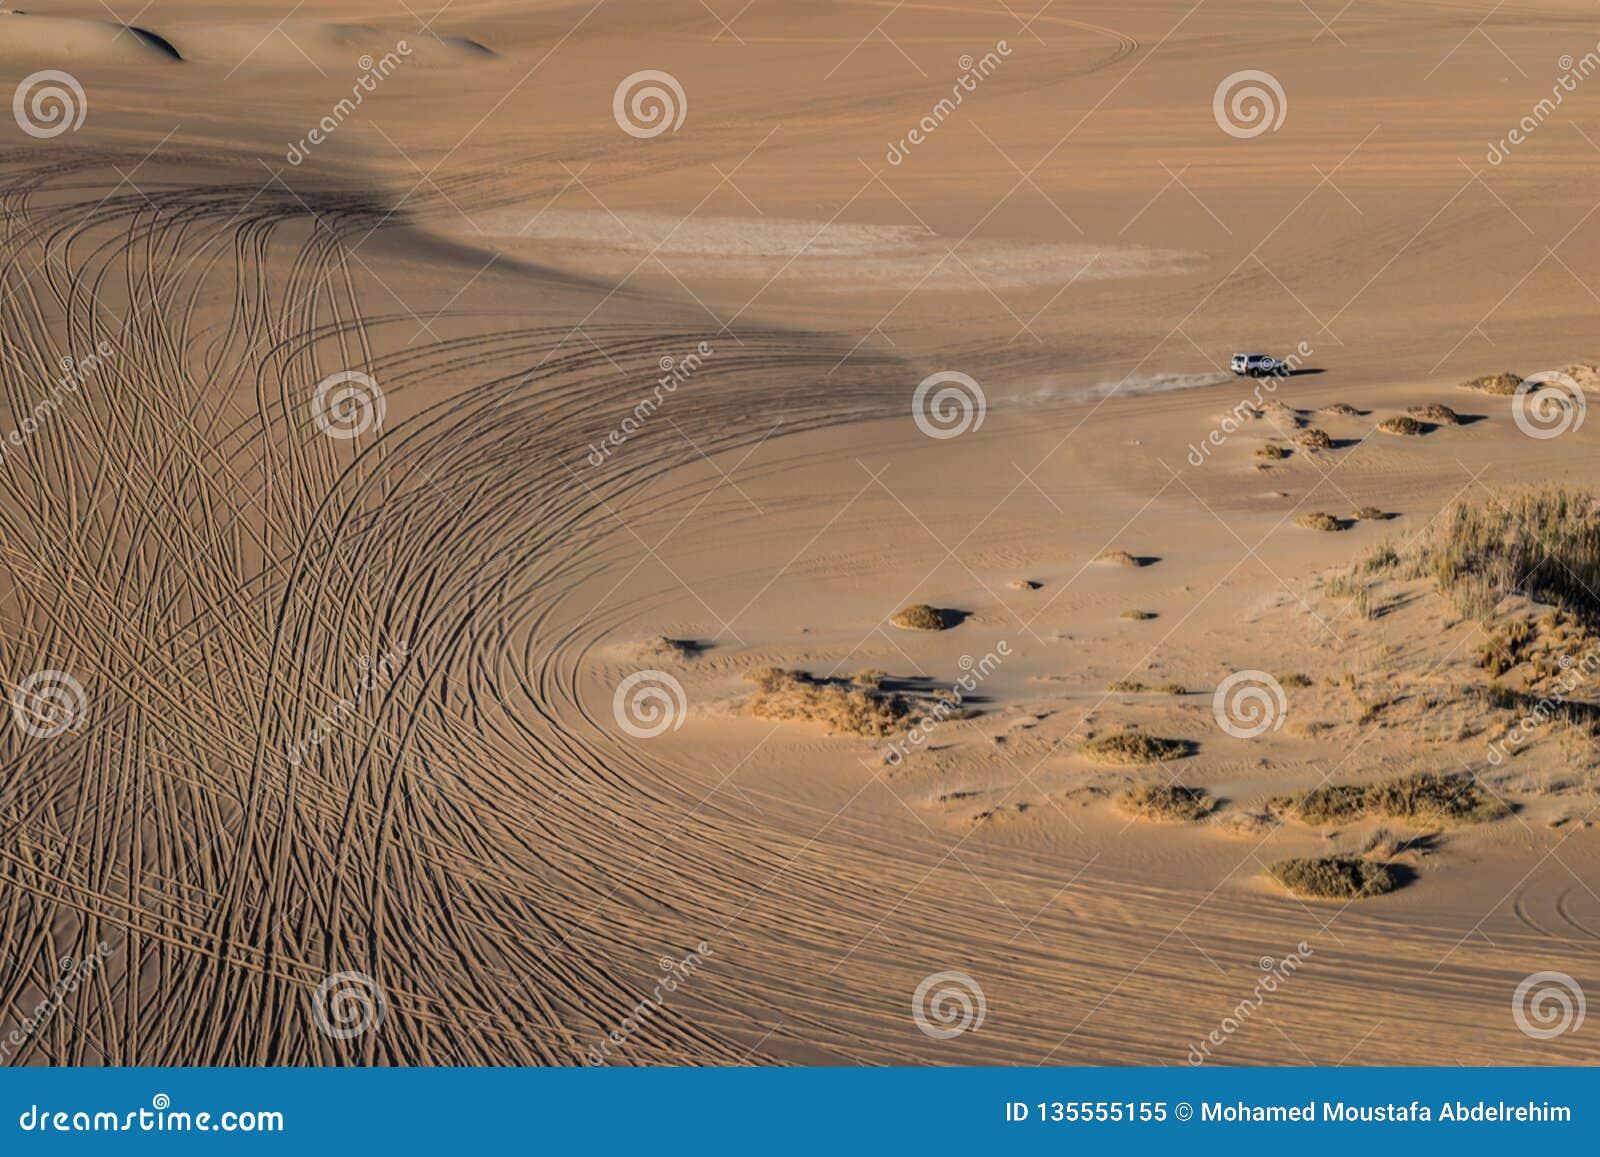 Viaje del safari en el desierto de Siwa, Egipto